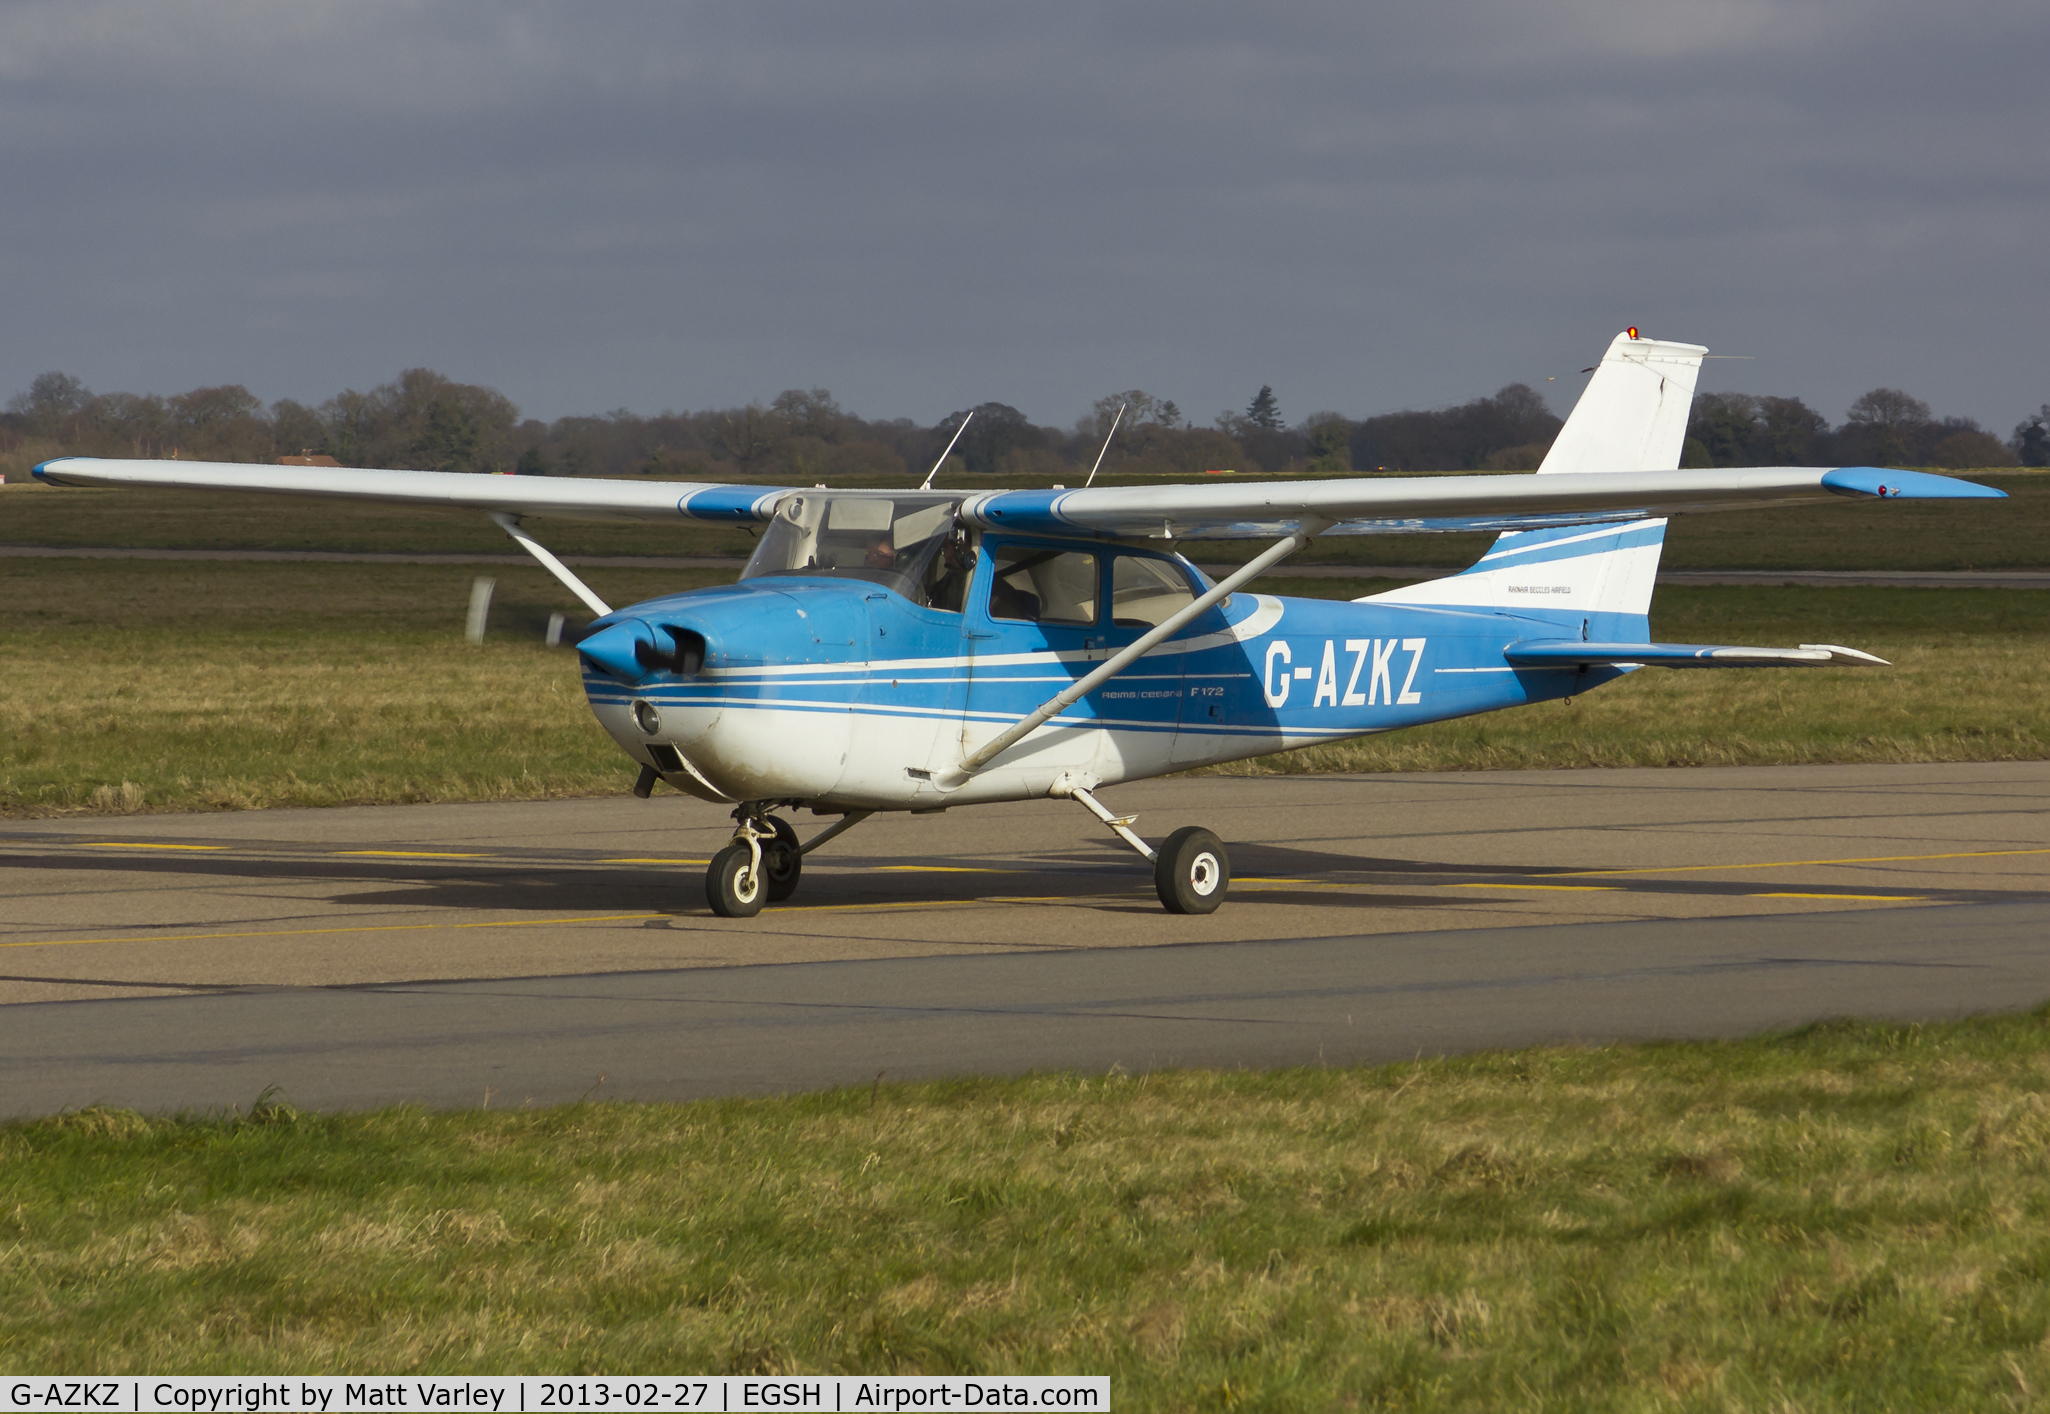 G-AZKZ, 1972 Reims F172L Skyhawk C/N 0814, Arriving at SaxonAir.